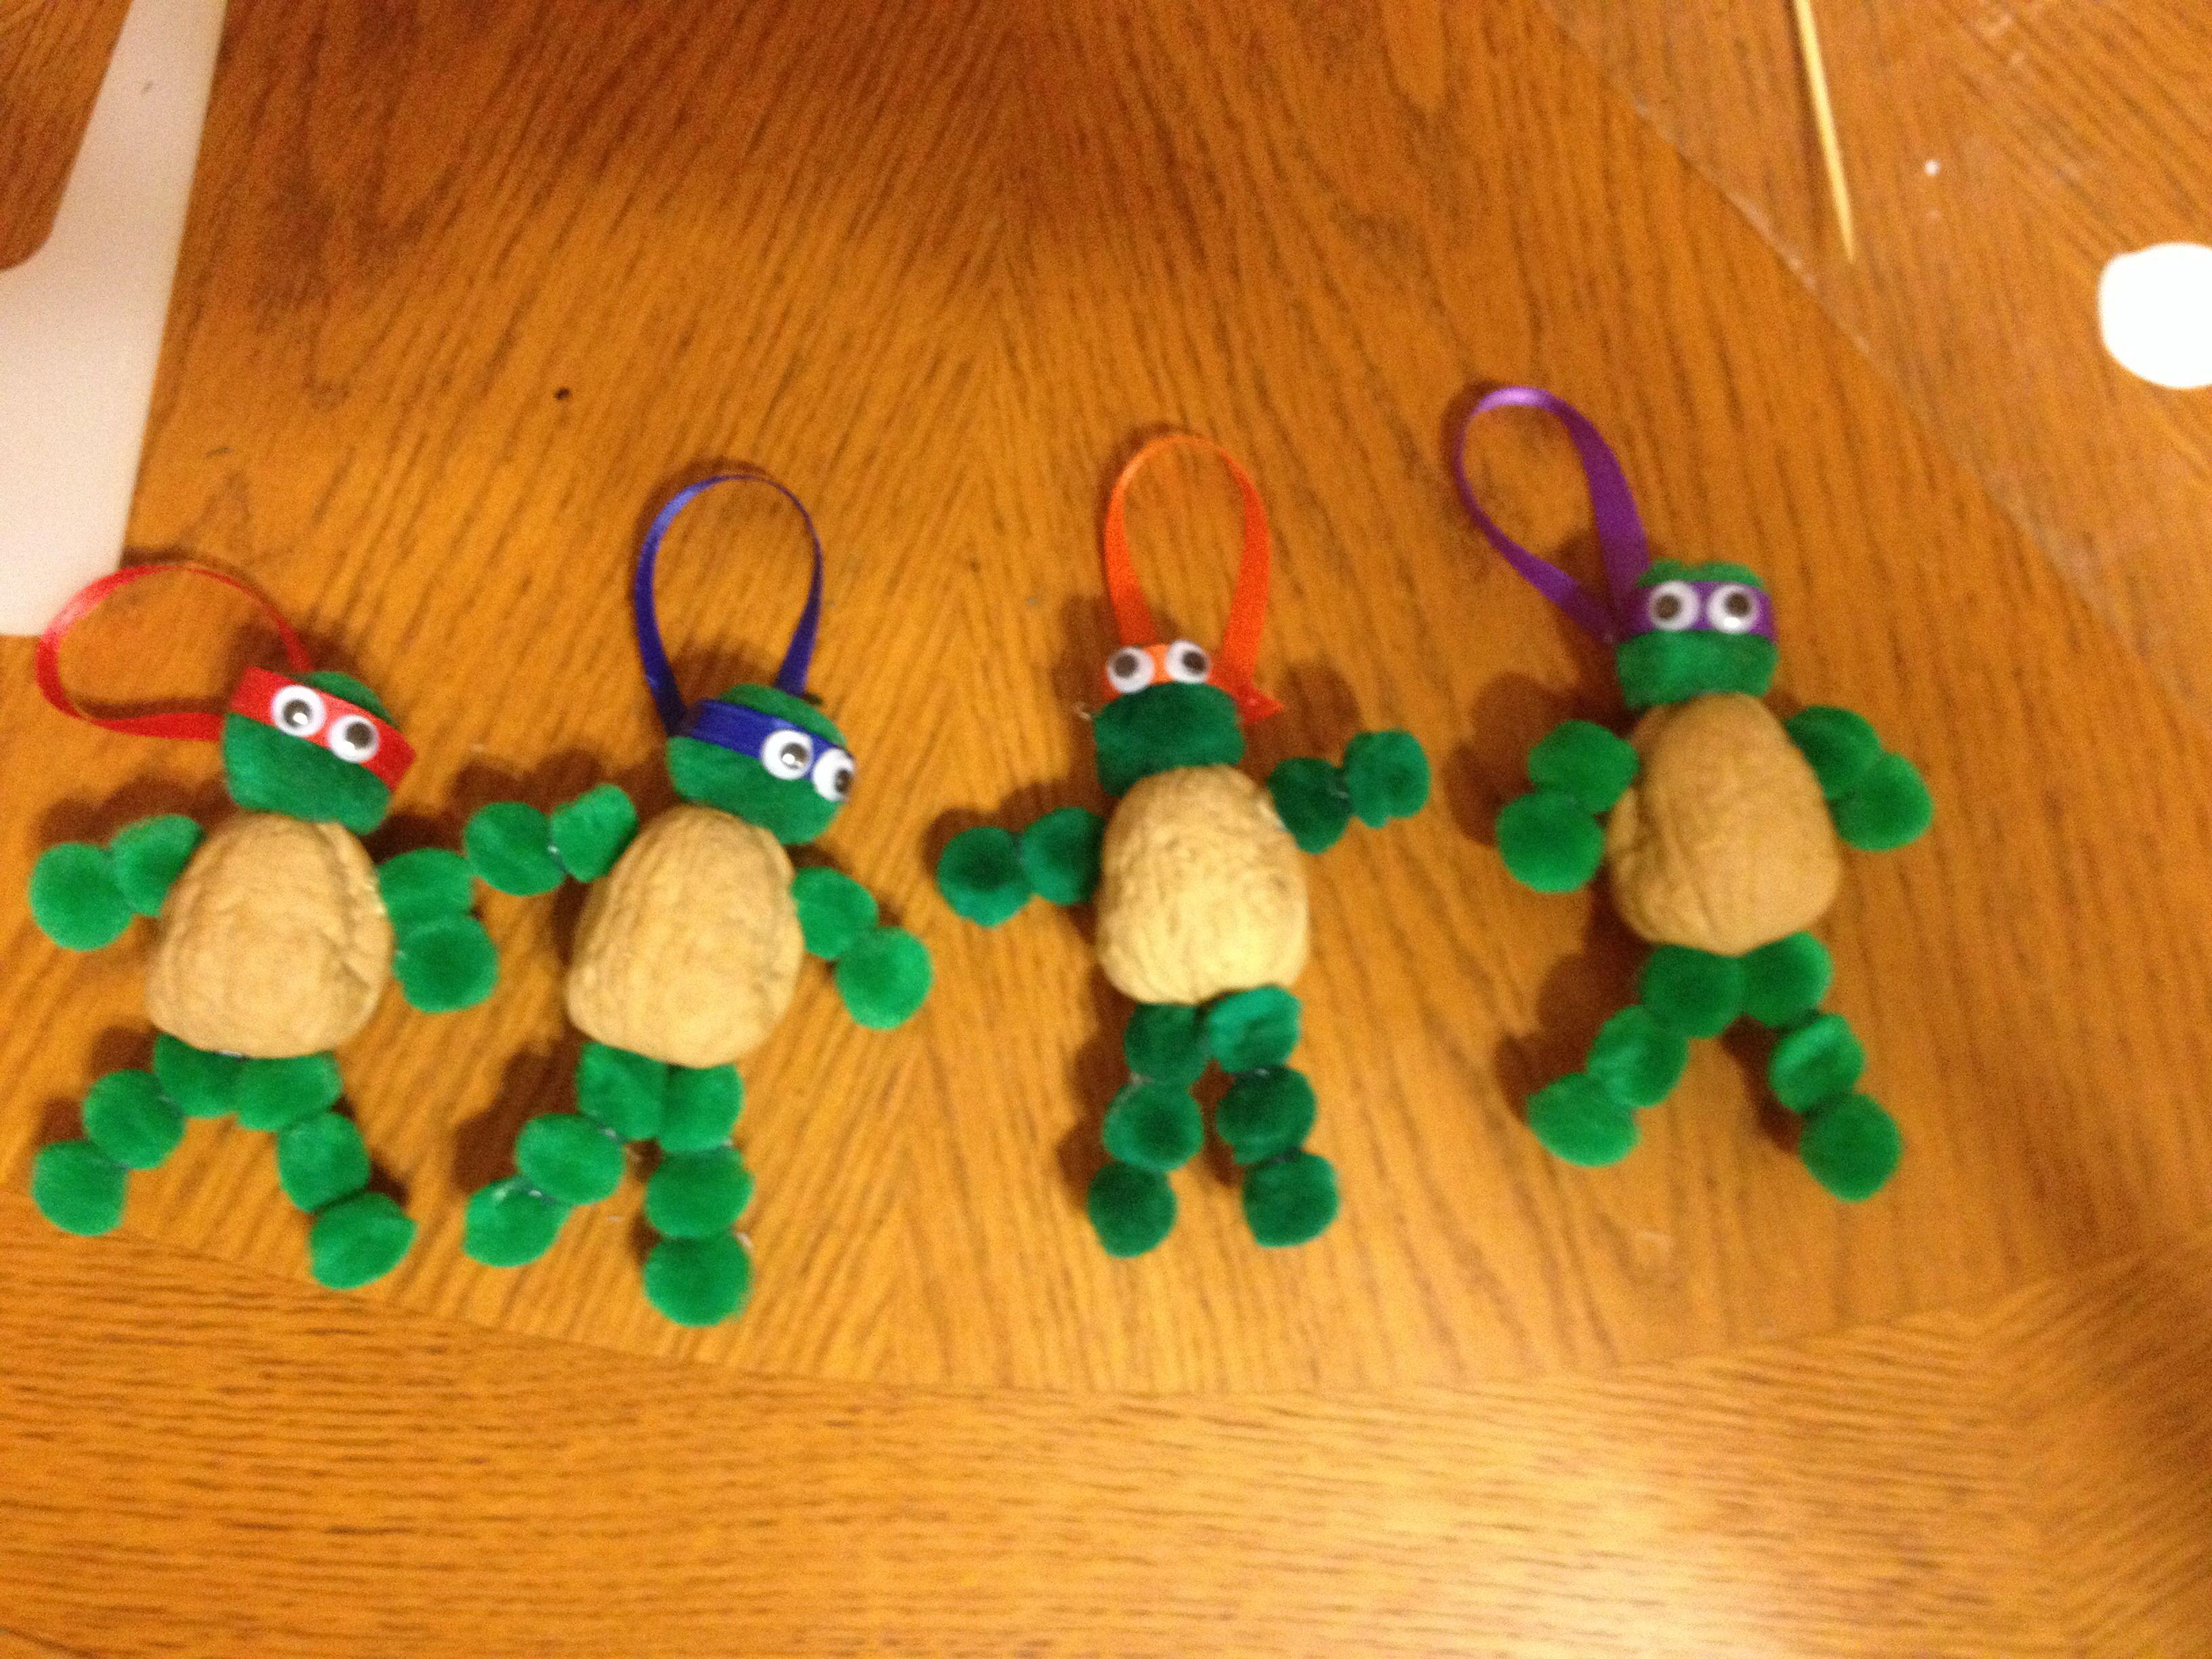 Teenage Mutant Ninja Turtle Ornaments Just Finished Making